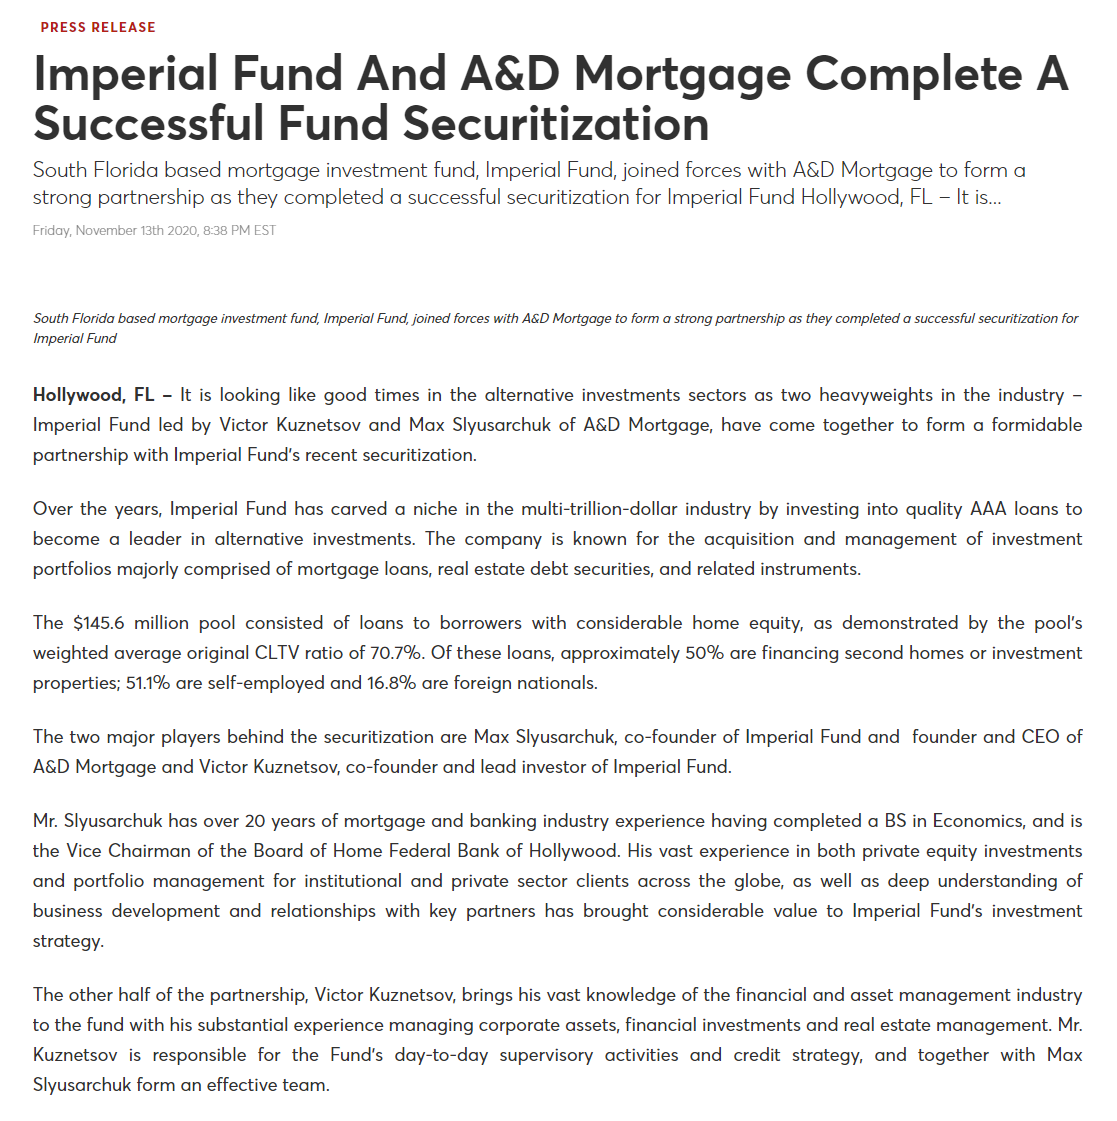 imperial fund securitization press release